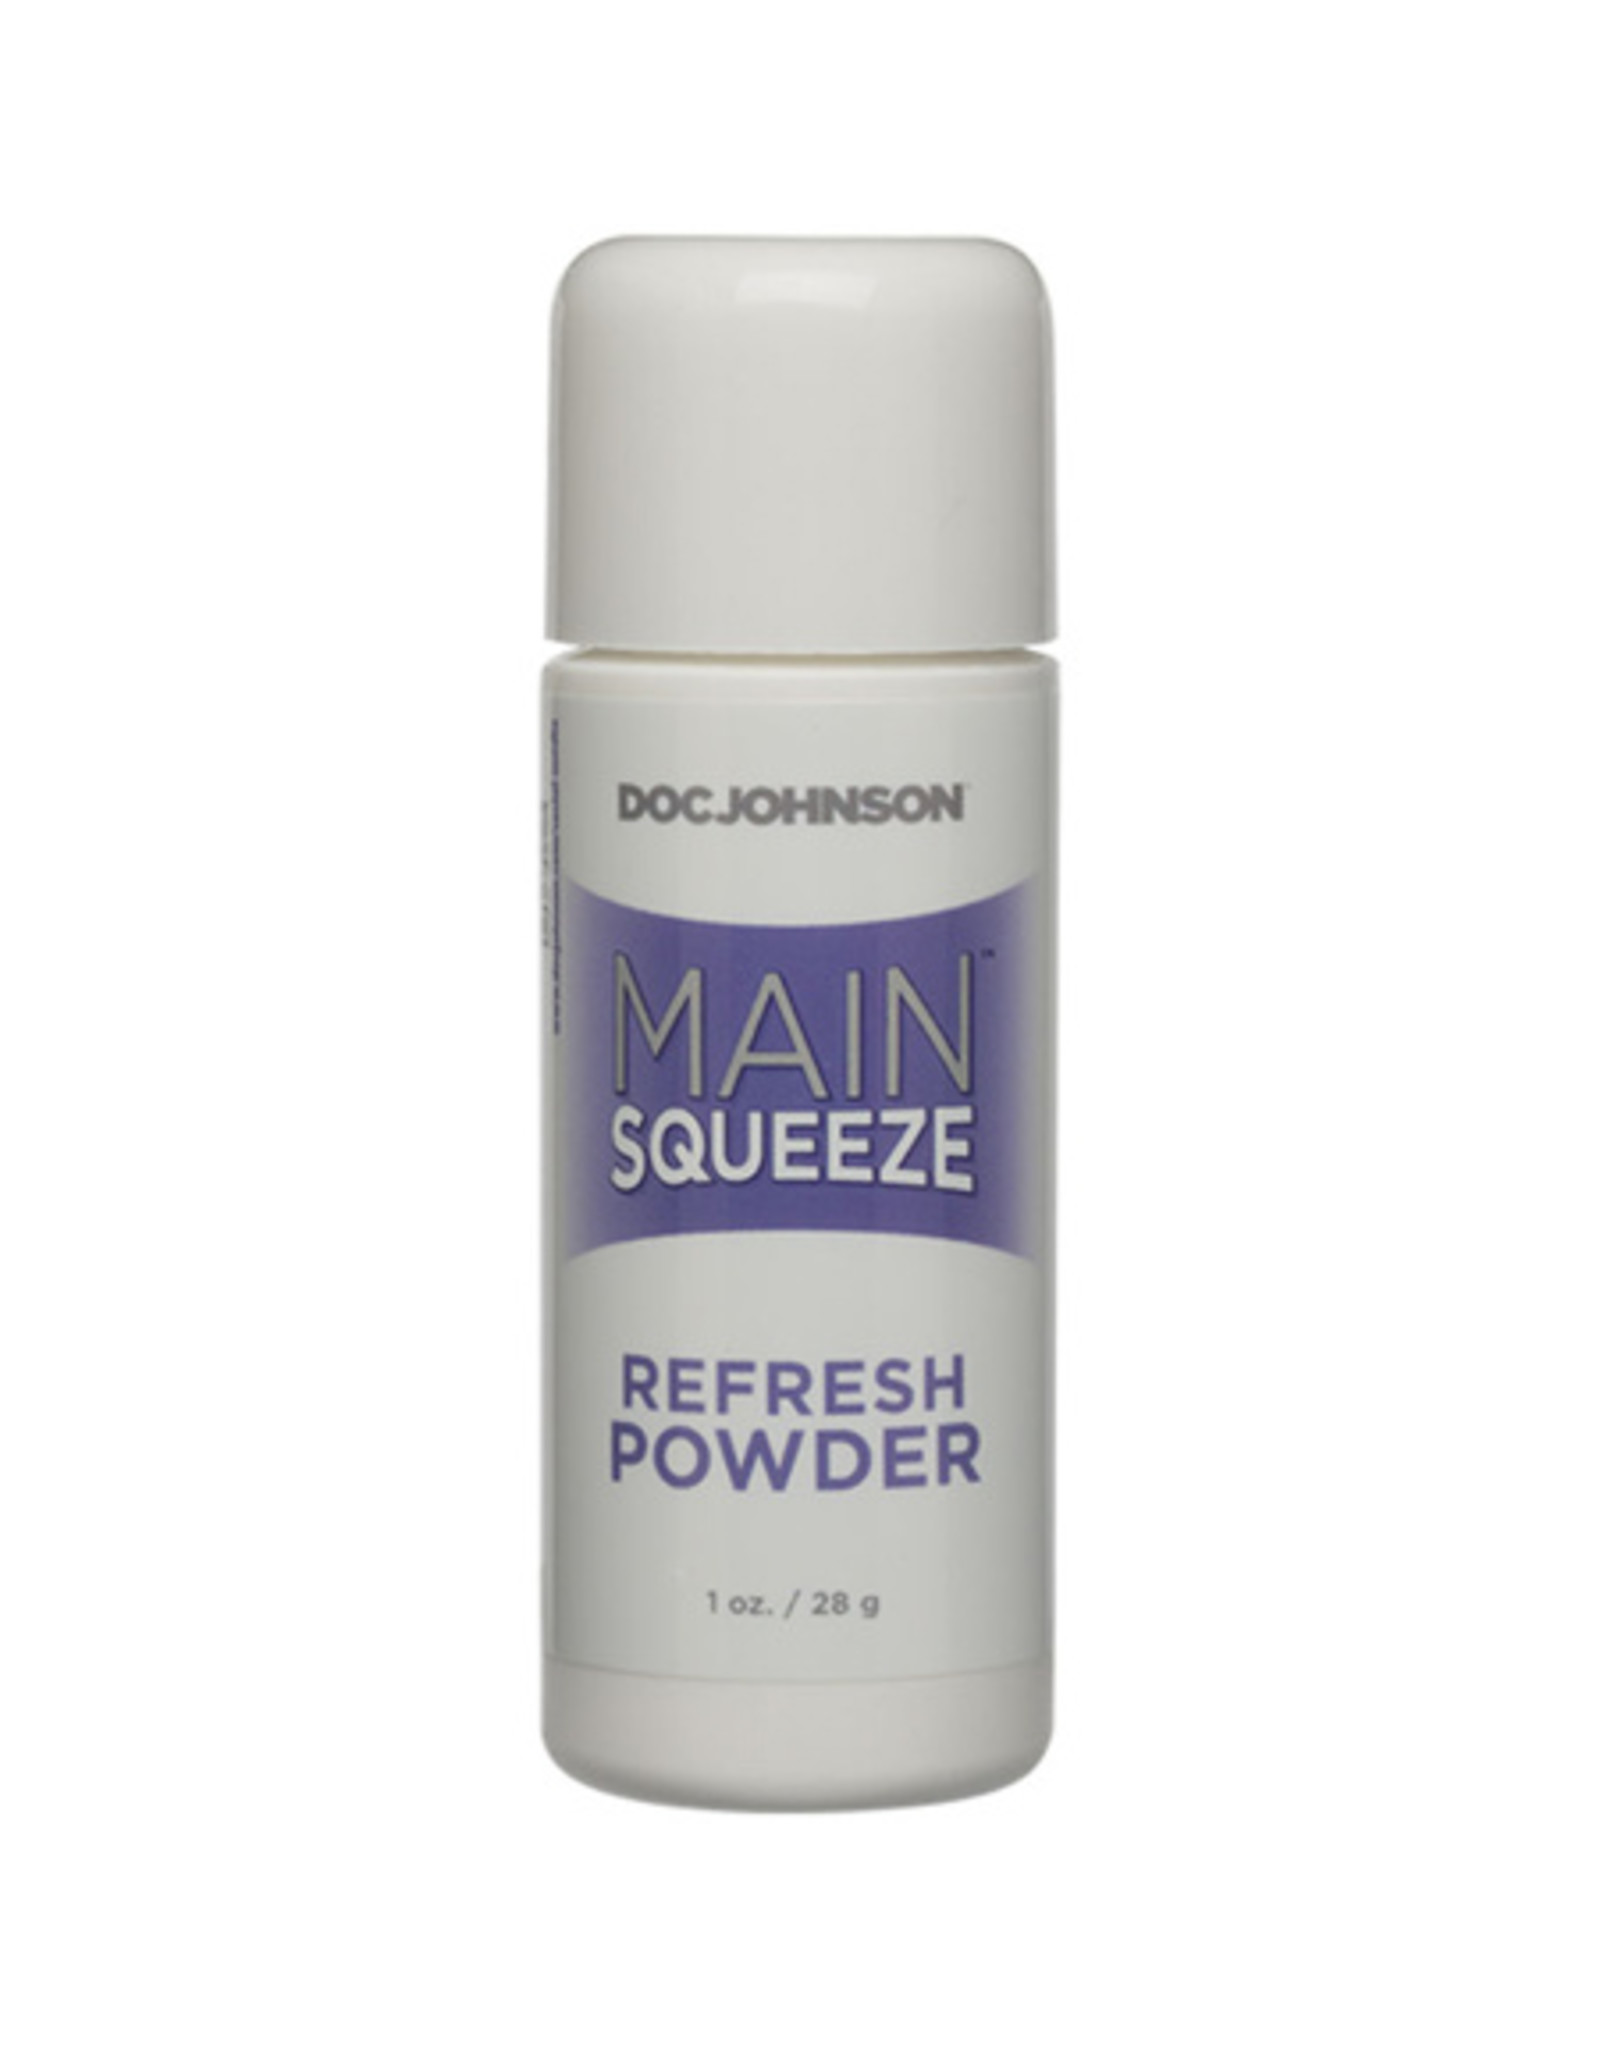 Main Squeeze Refresh Powder